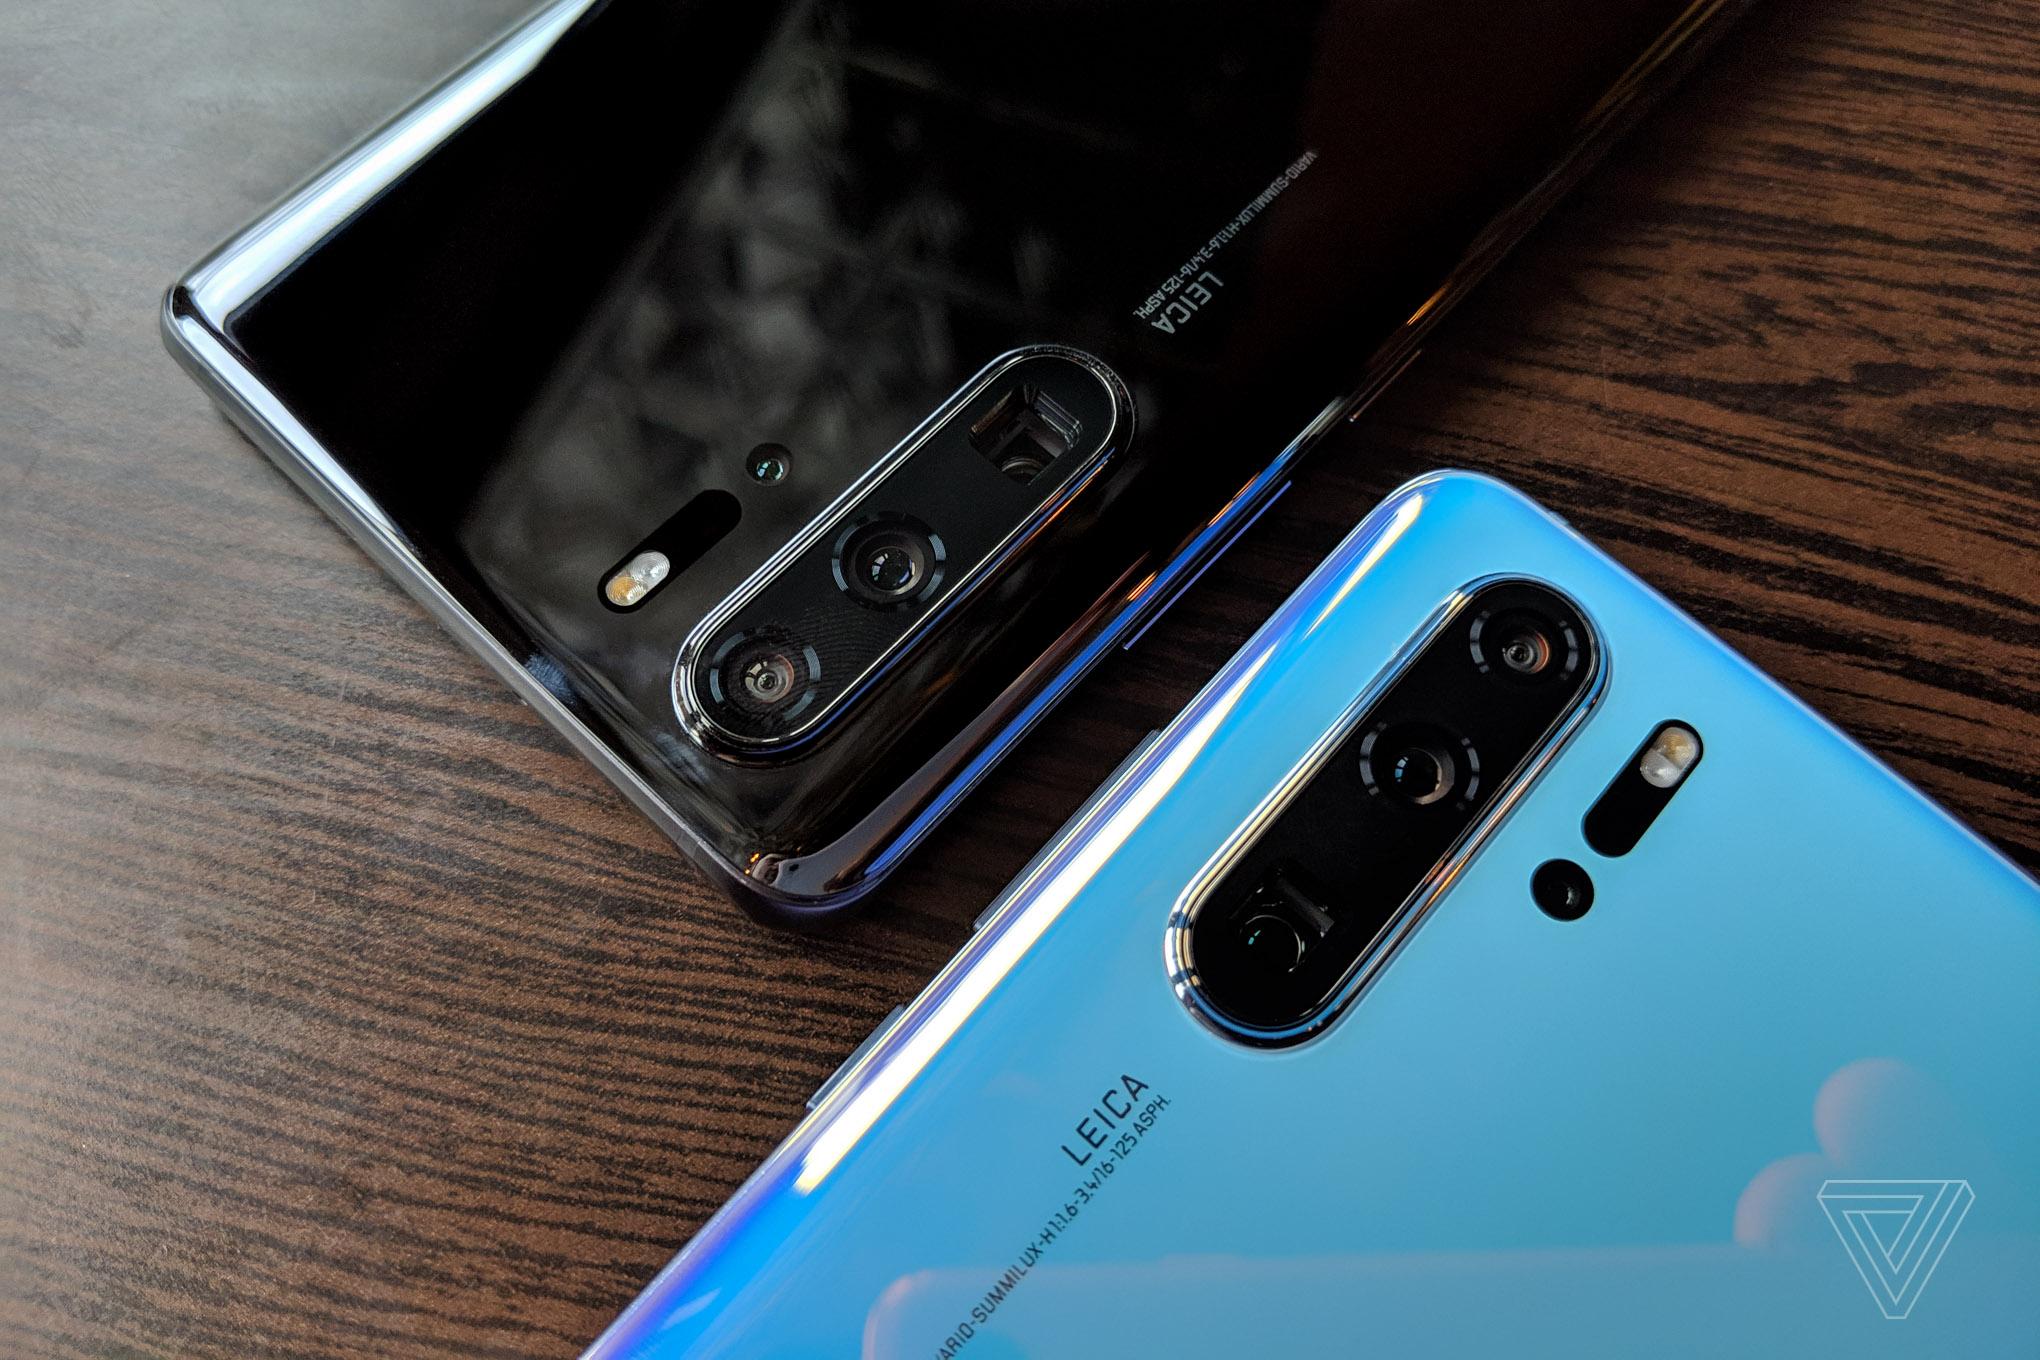 Huawei P30, P30 PRO, PRET, LANSARE, IMAGINI, NOUTATI, SPECIFICATII